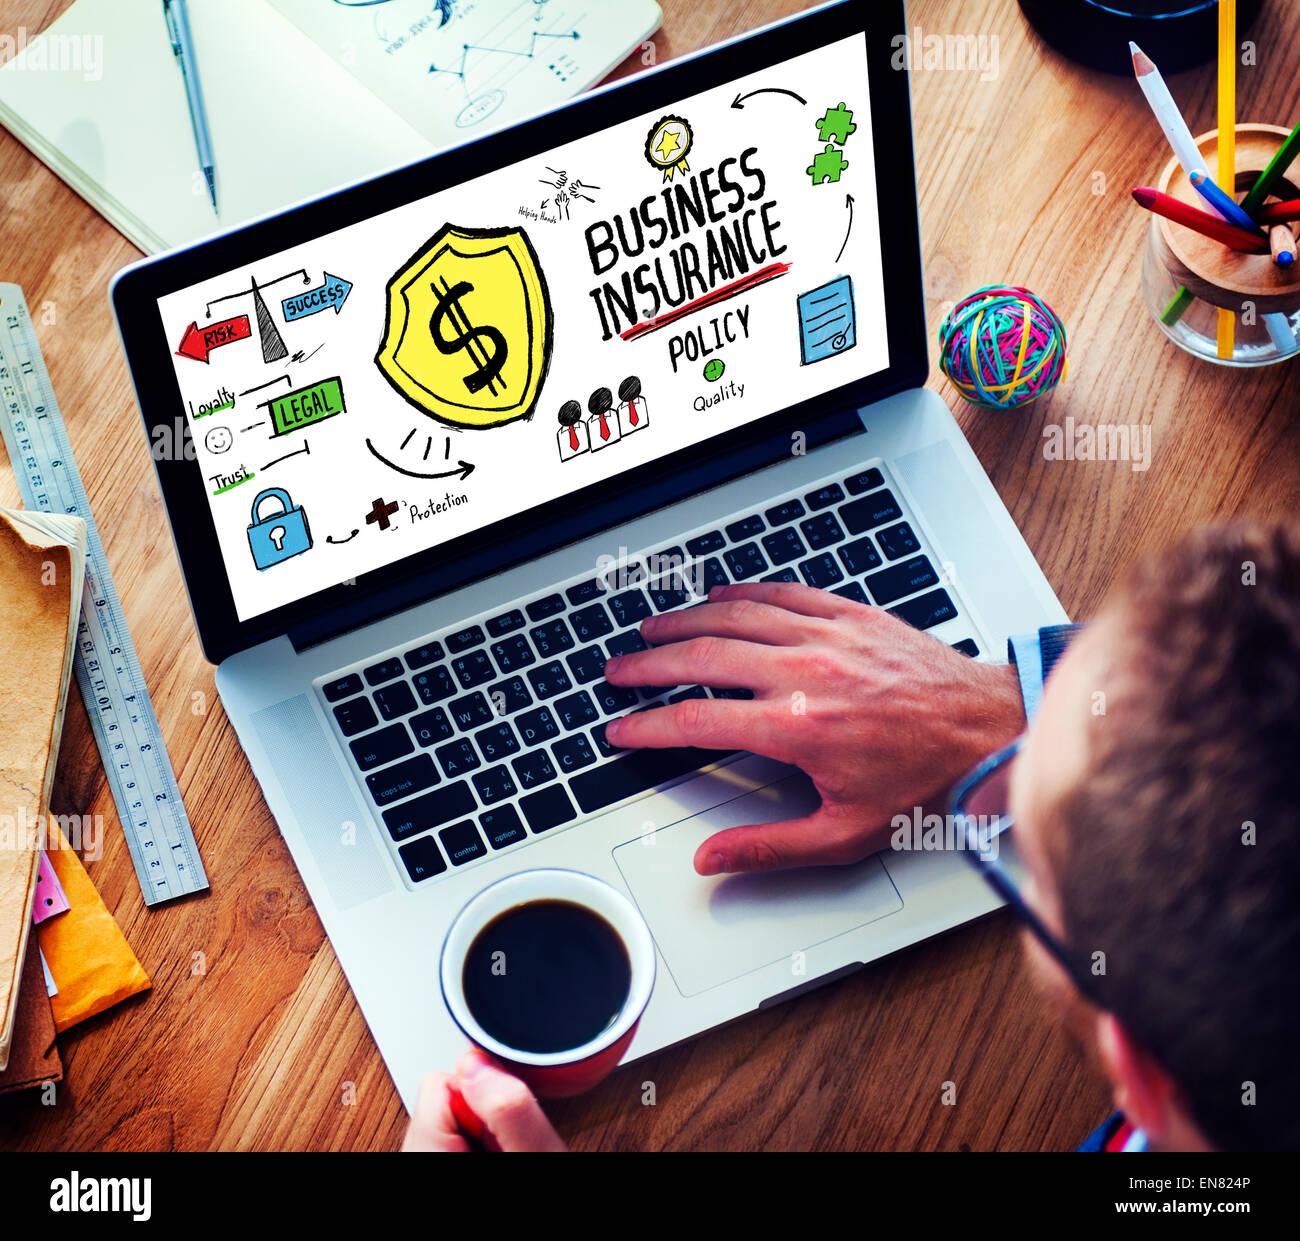 Laptop Technology Risk Business Insurance Concept Stock Photo